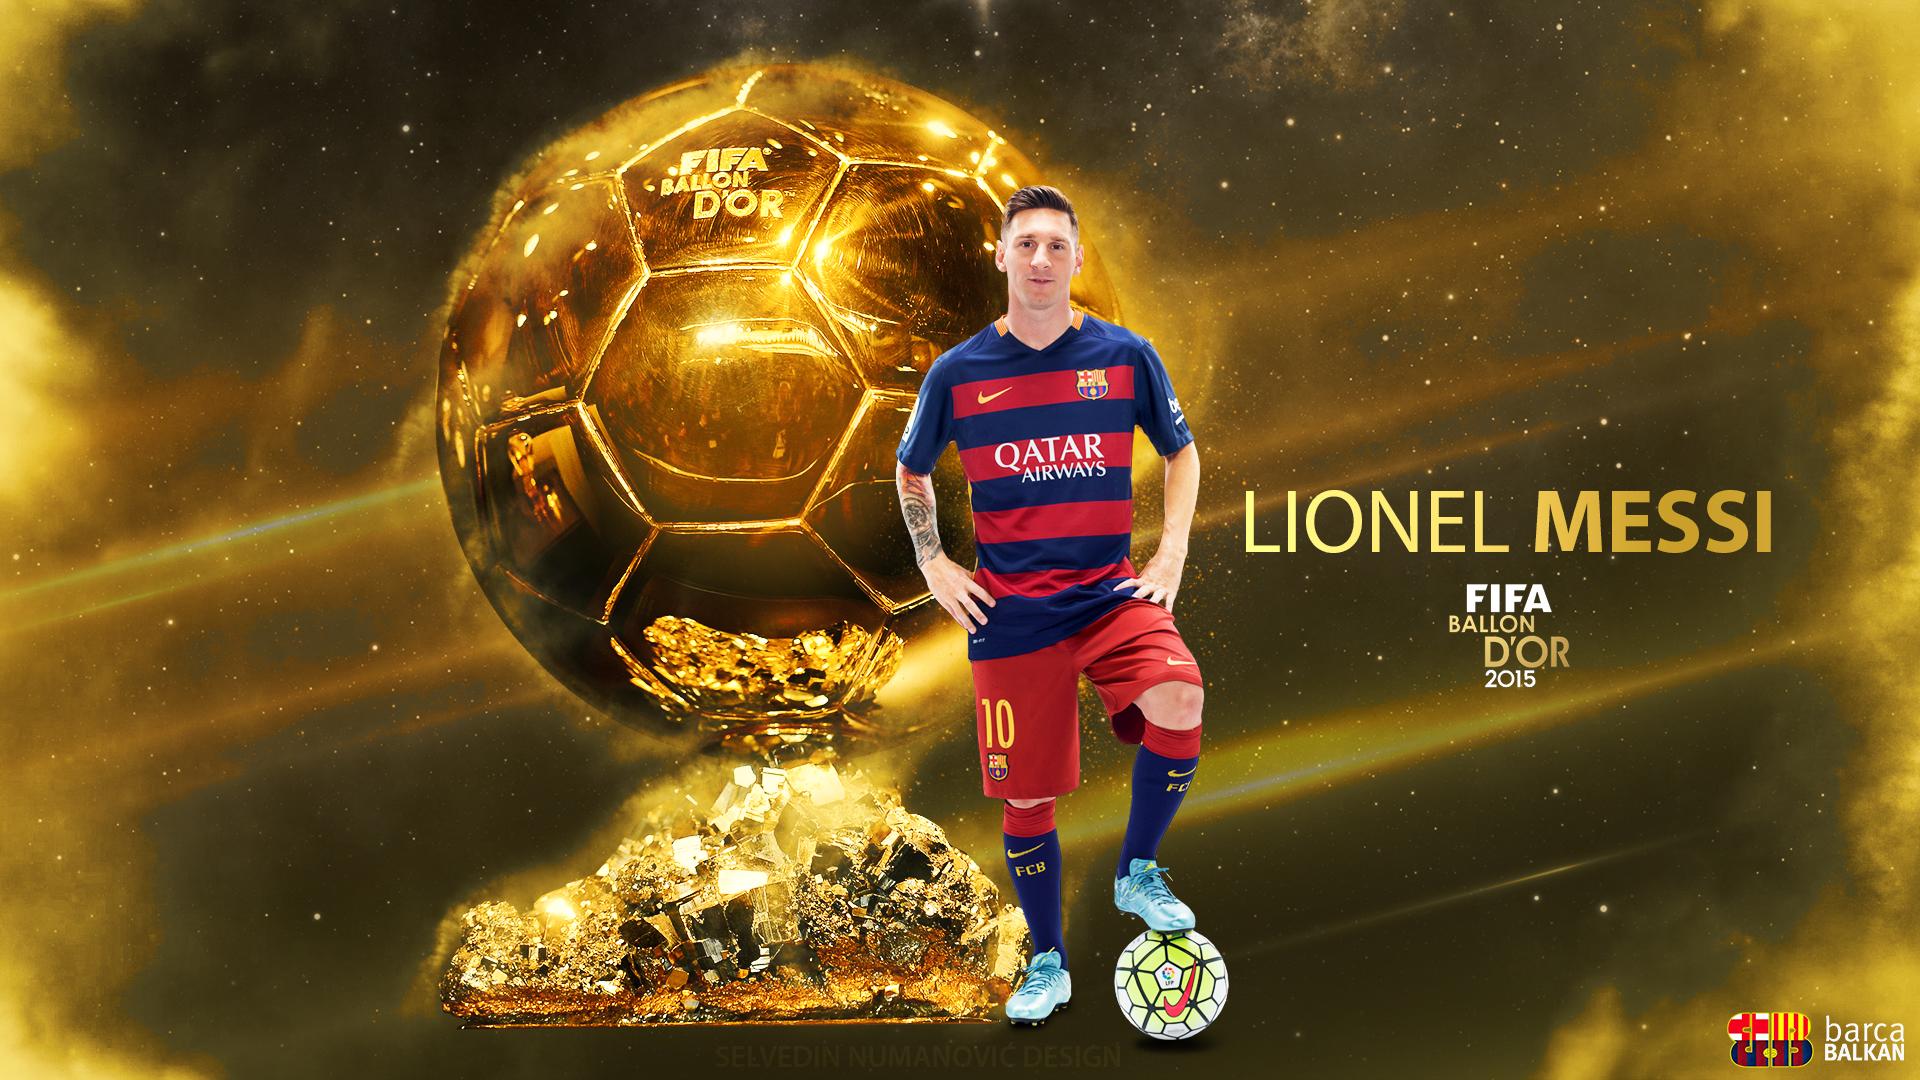 Lionel Messi FIFA Ballon dOr 2015 HD wallpaper by SelvedinFCB on 1920x1080